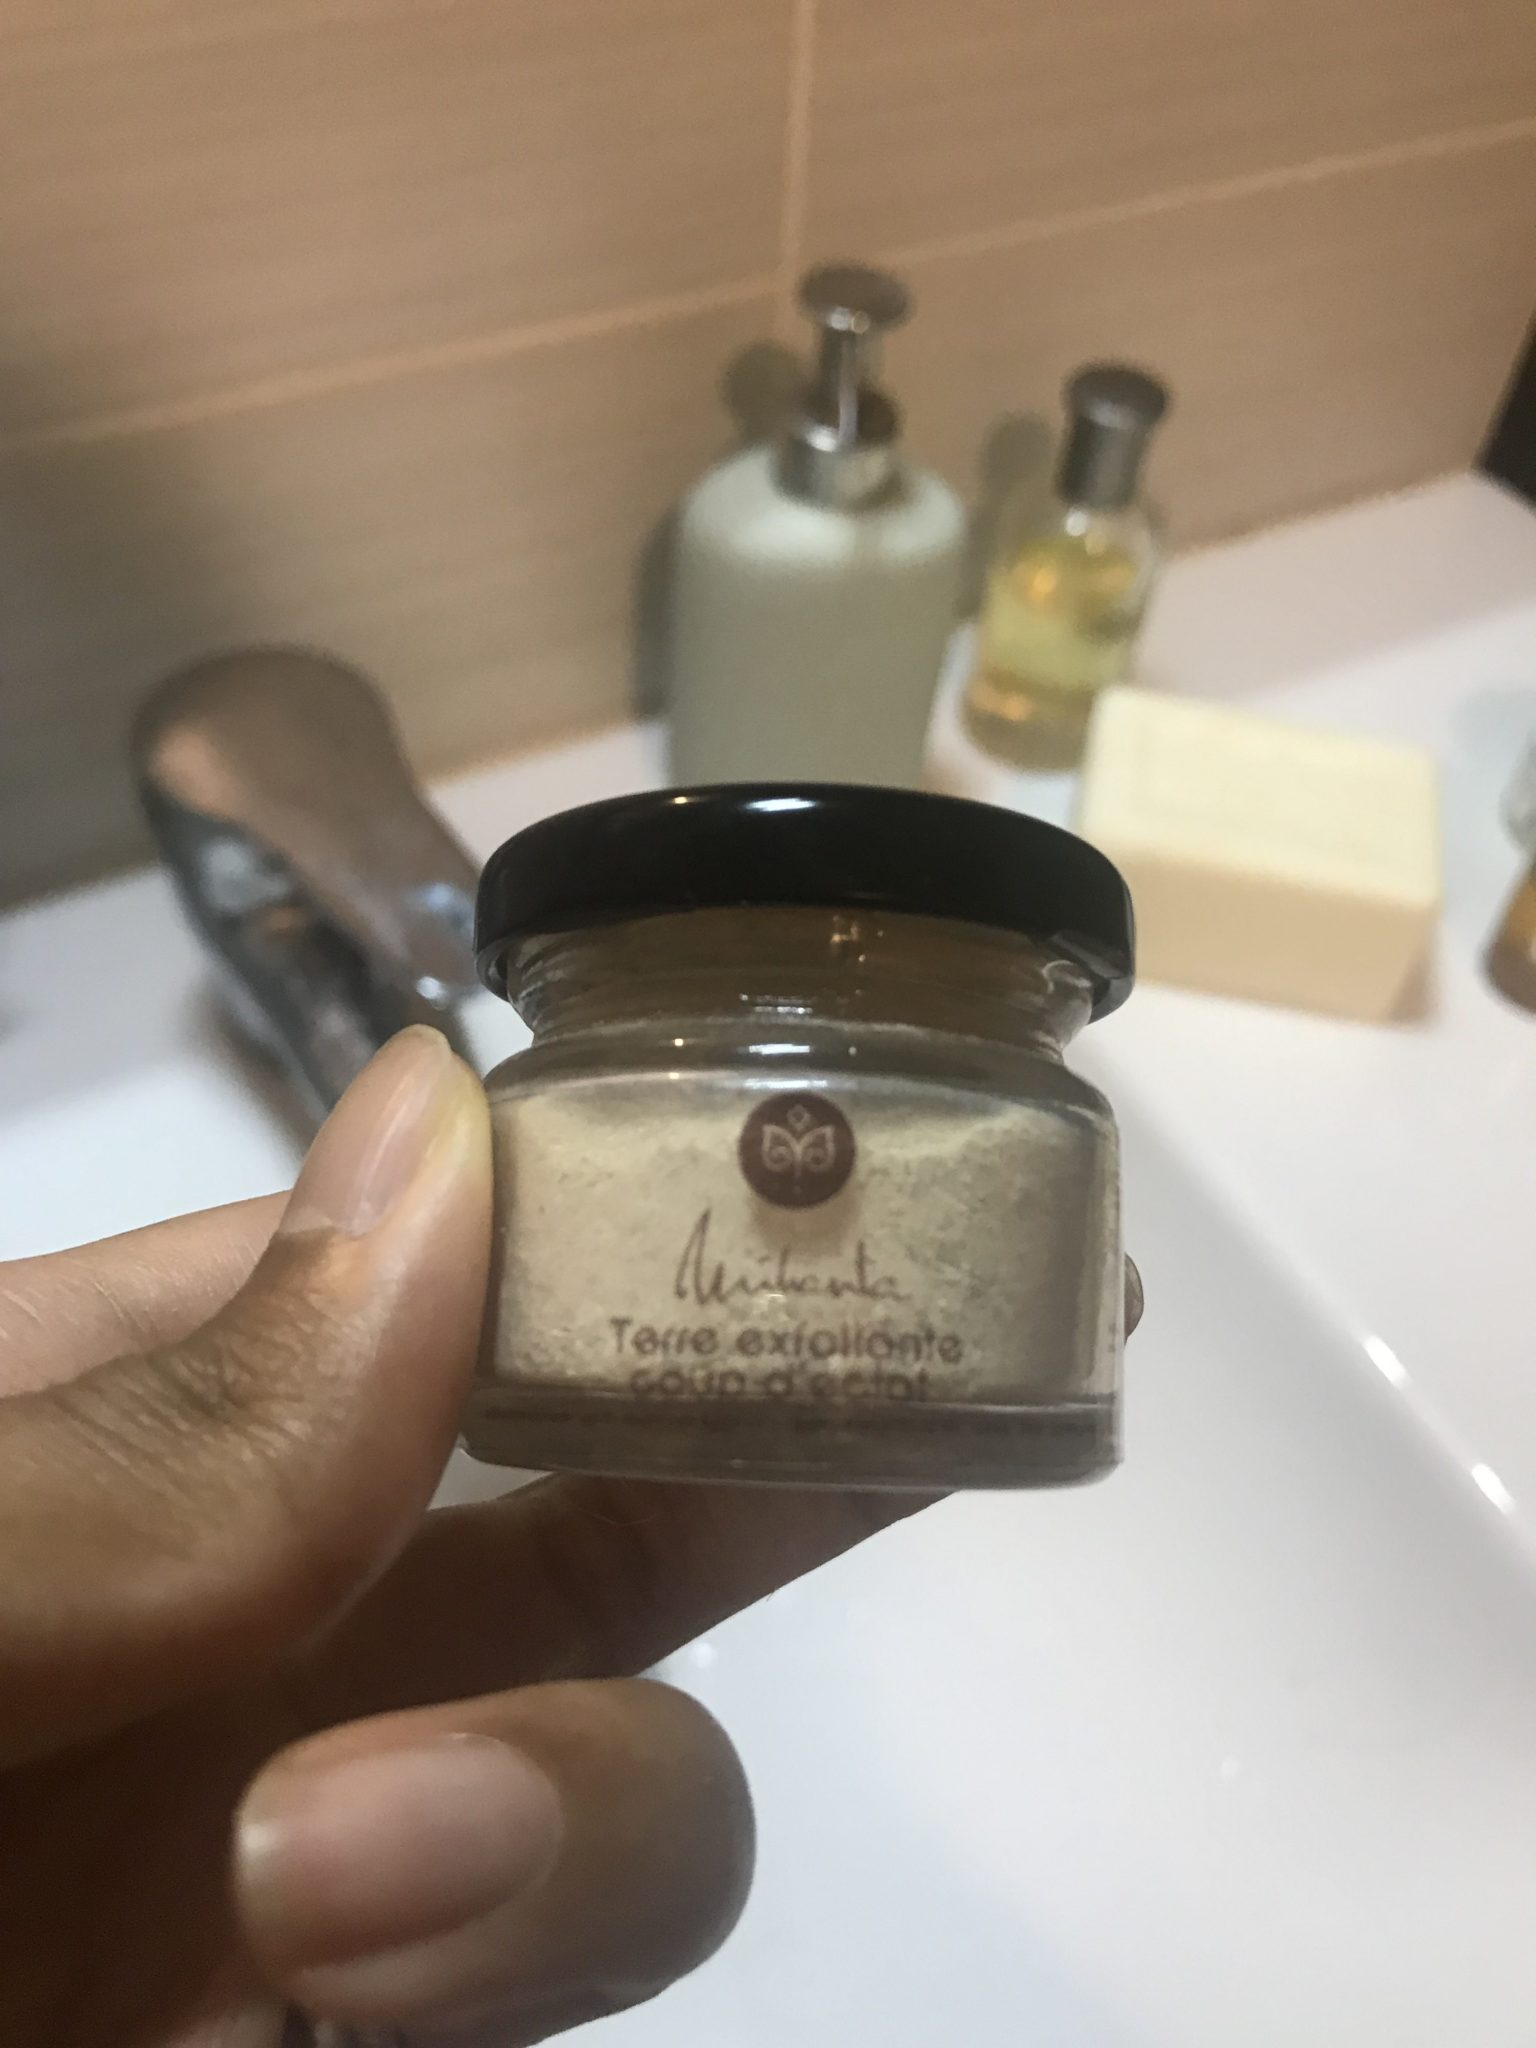 terre exfoliante mihanta cosmetiques